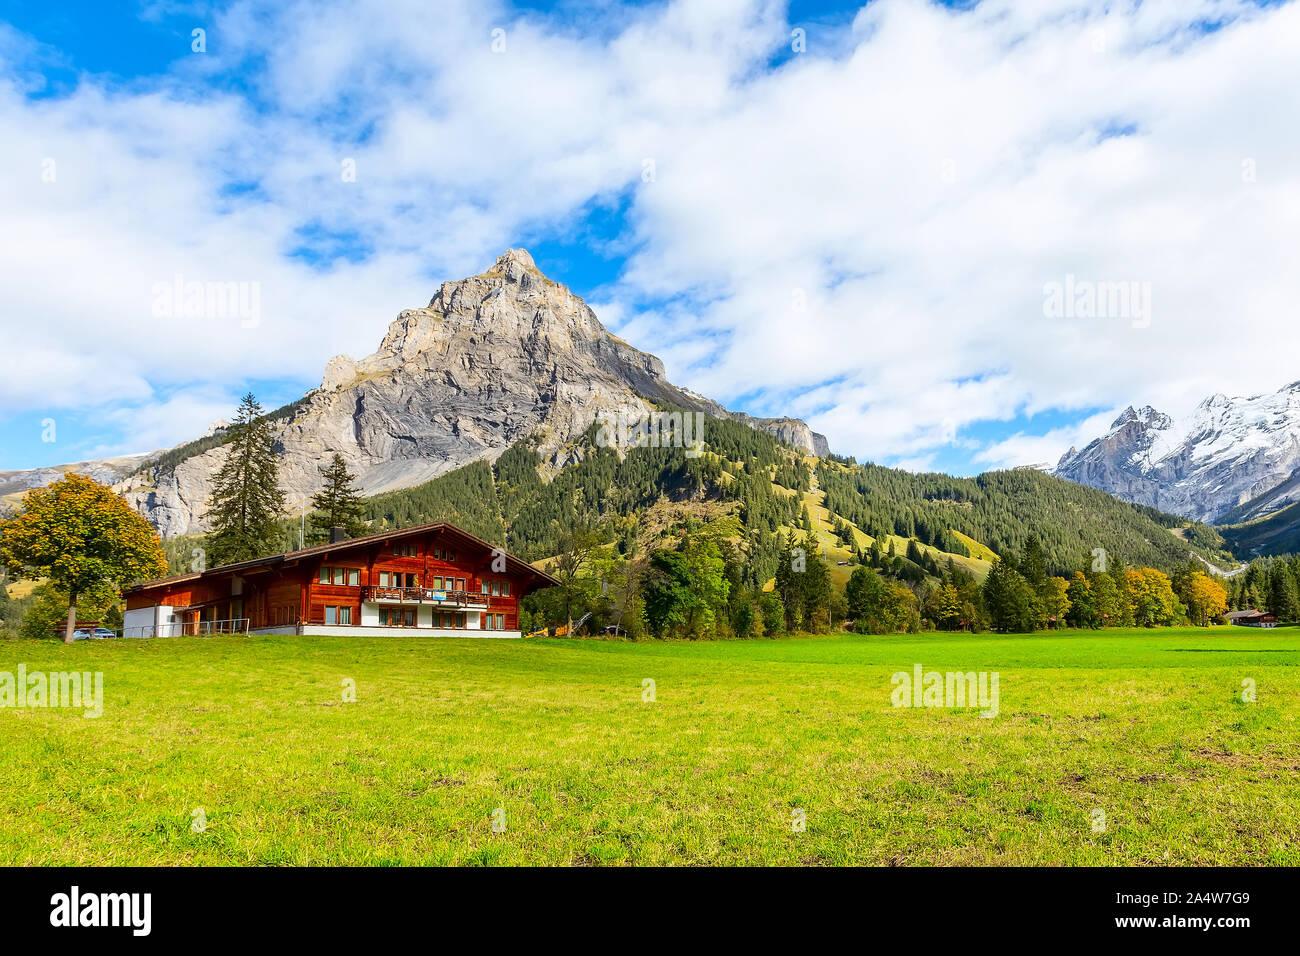 Wooden chalet in Kandersteg village, Canton Bern, Switzerland, Europe, Autumn trees and mountains panorama Stock Photo